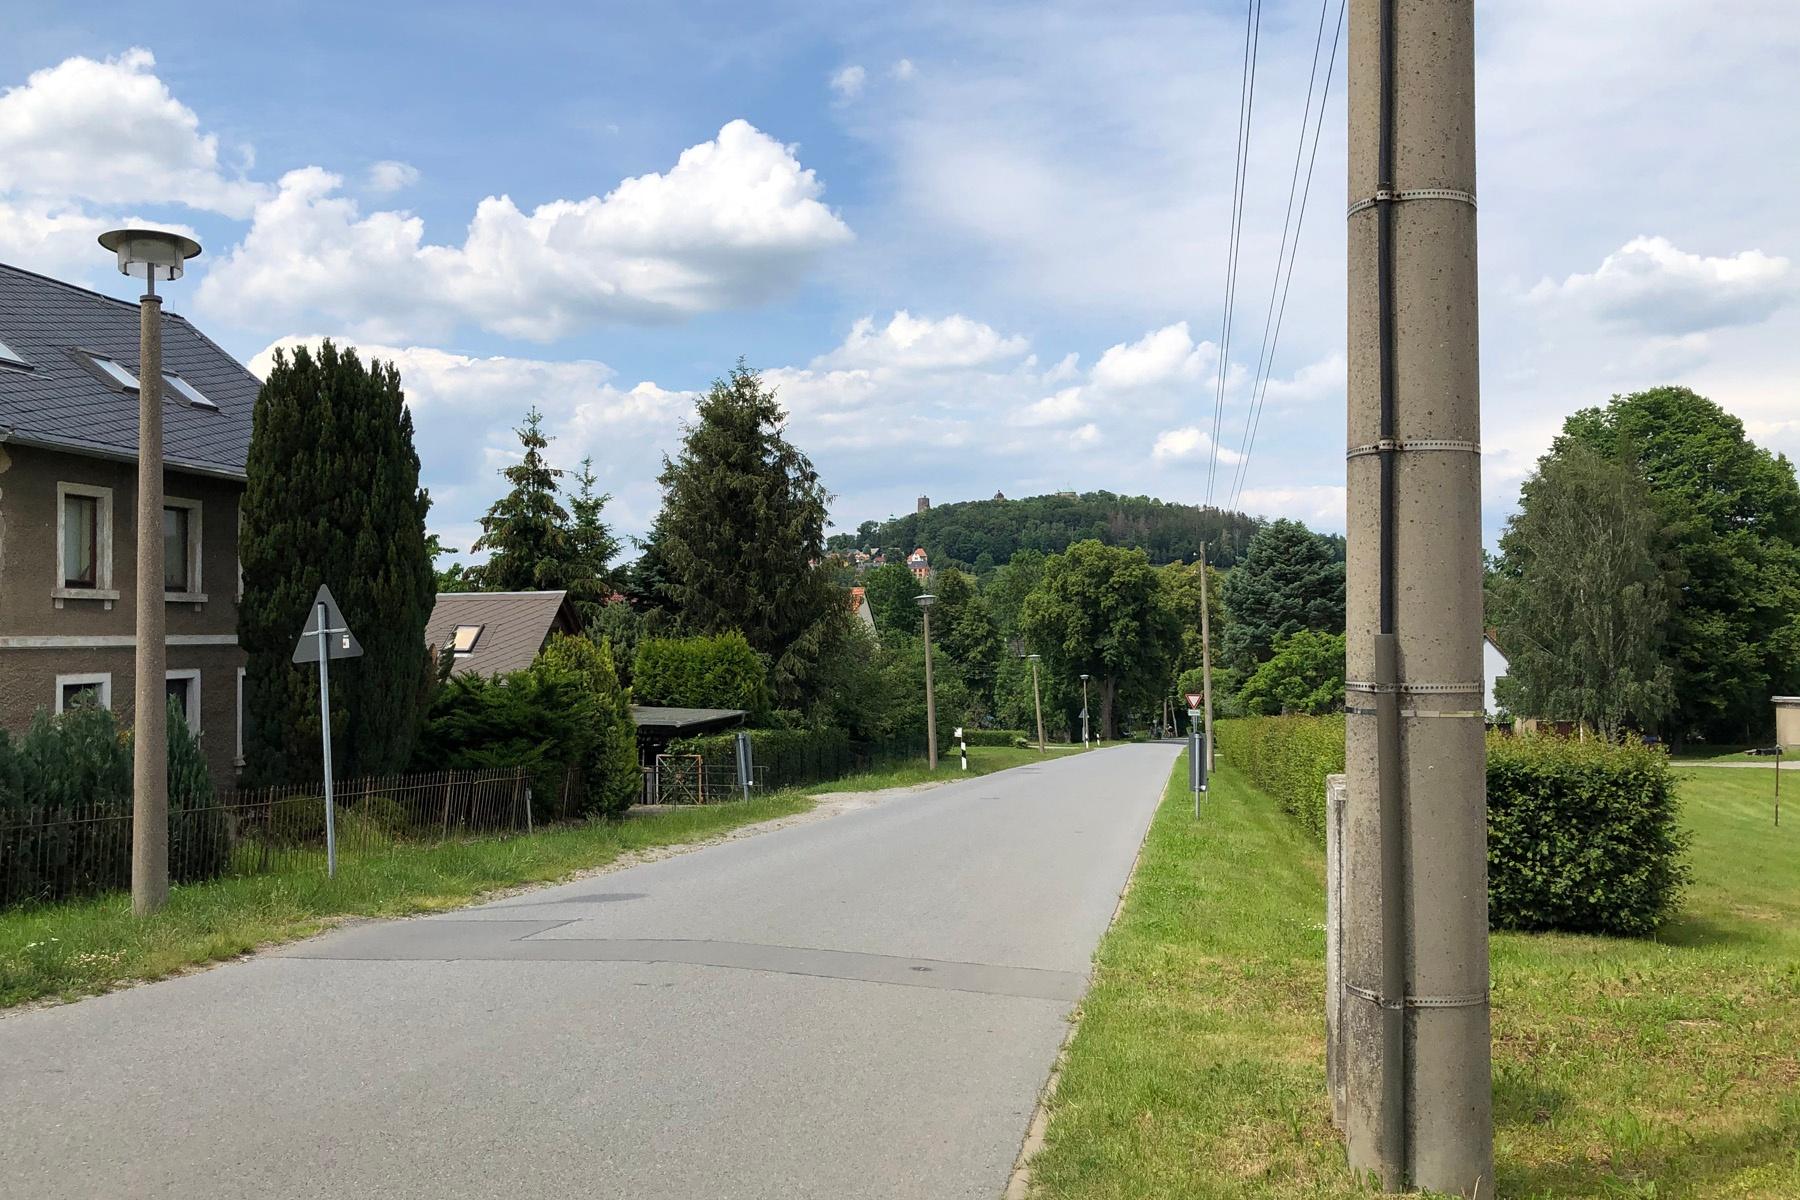 Weg vom Bahnhof nach Stolpen